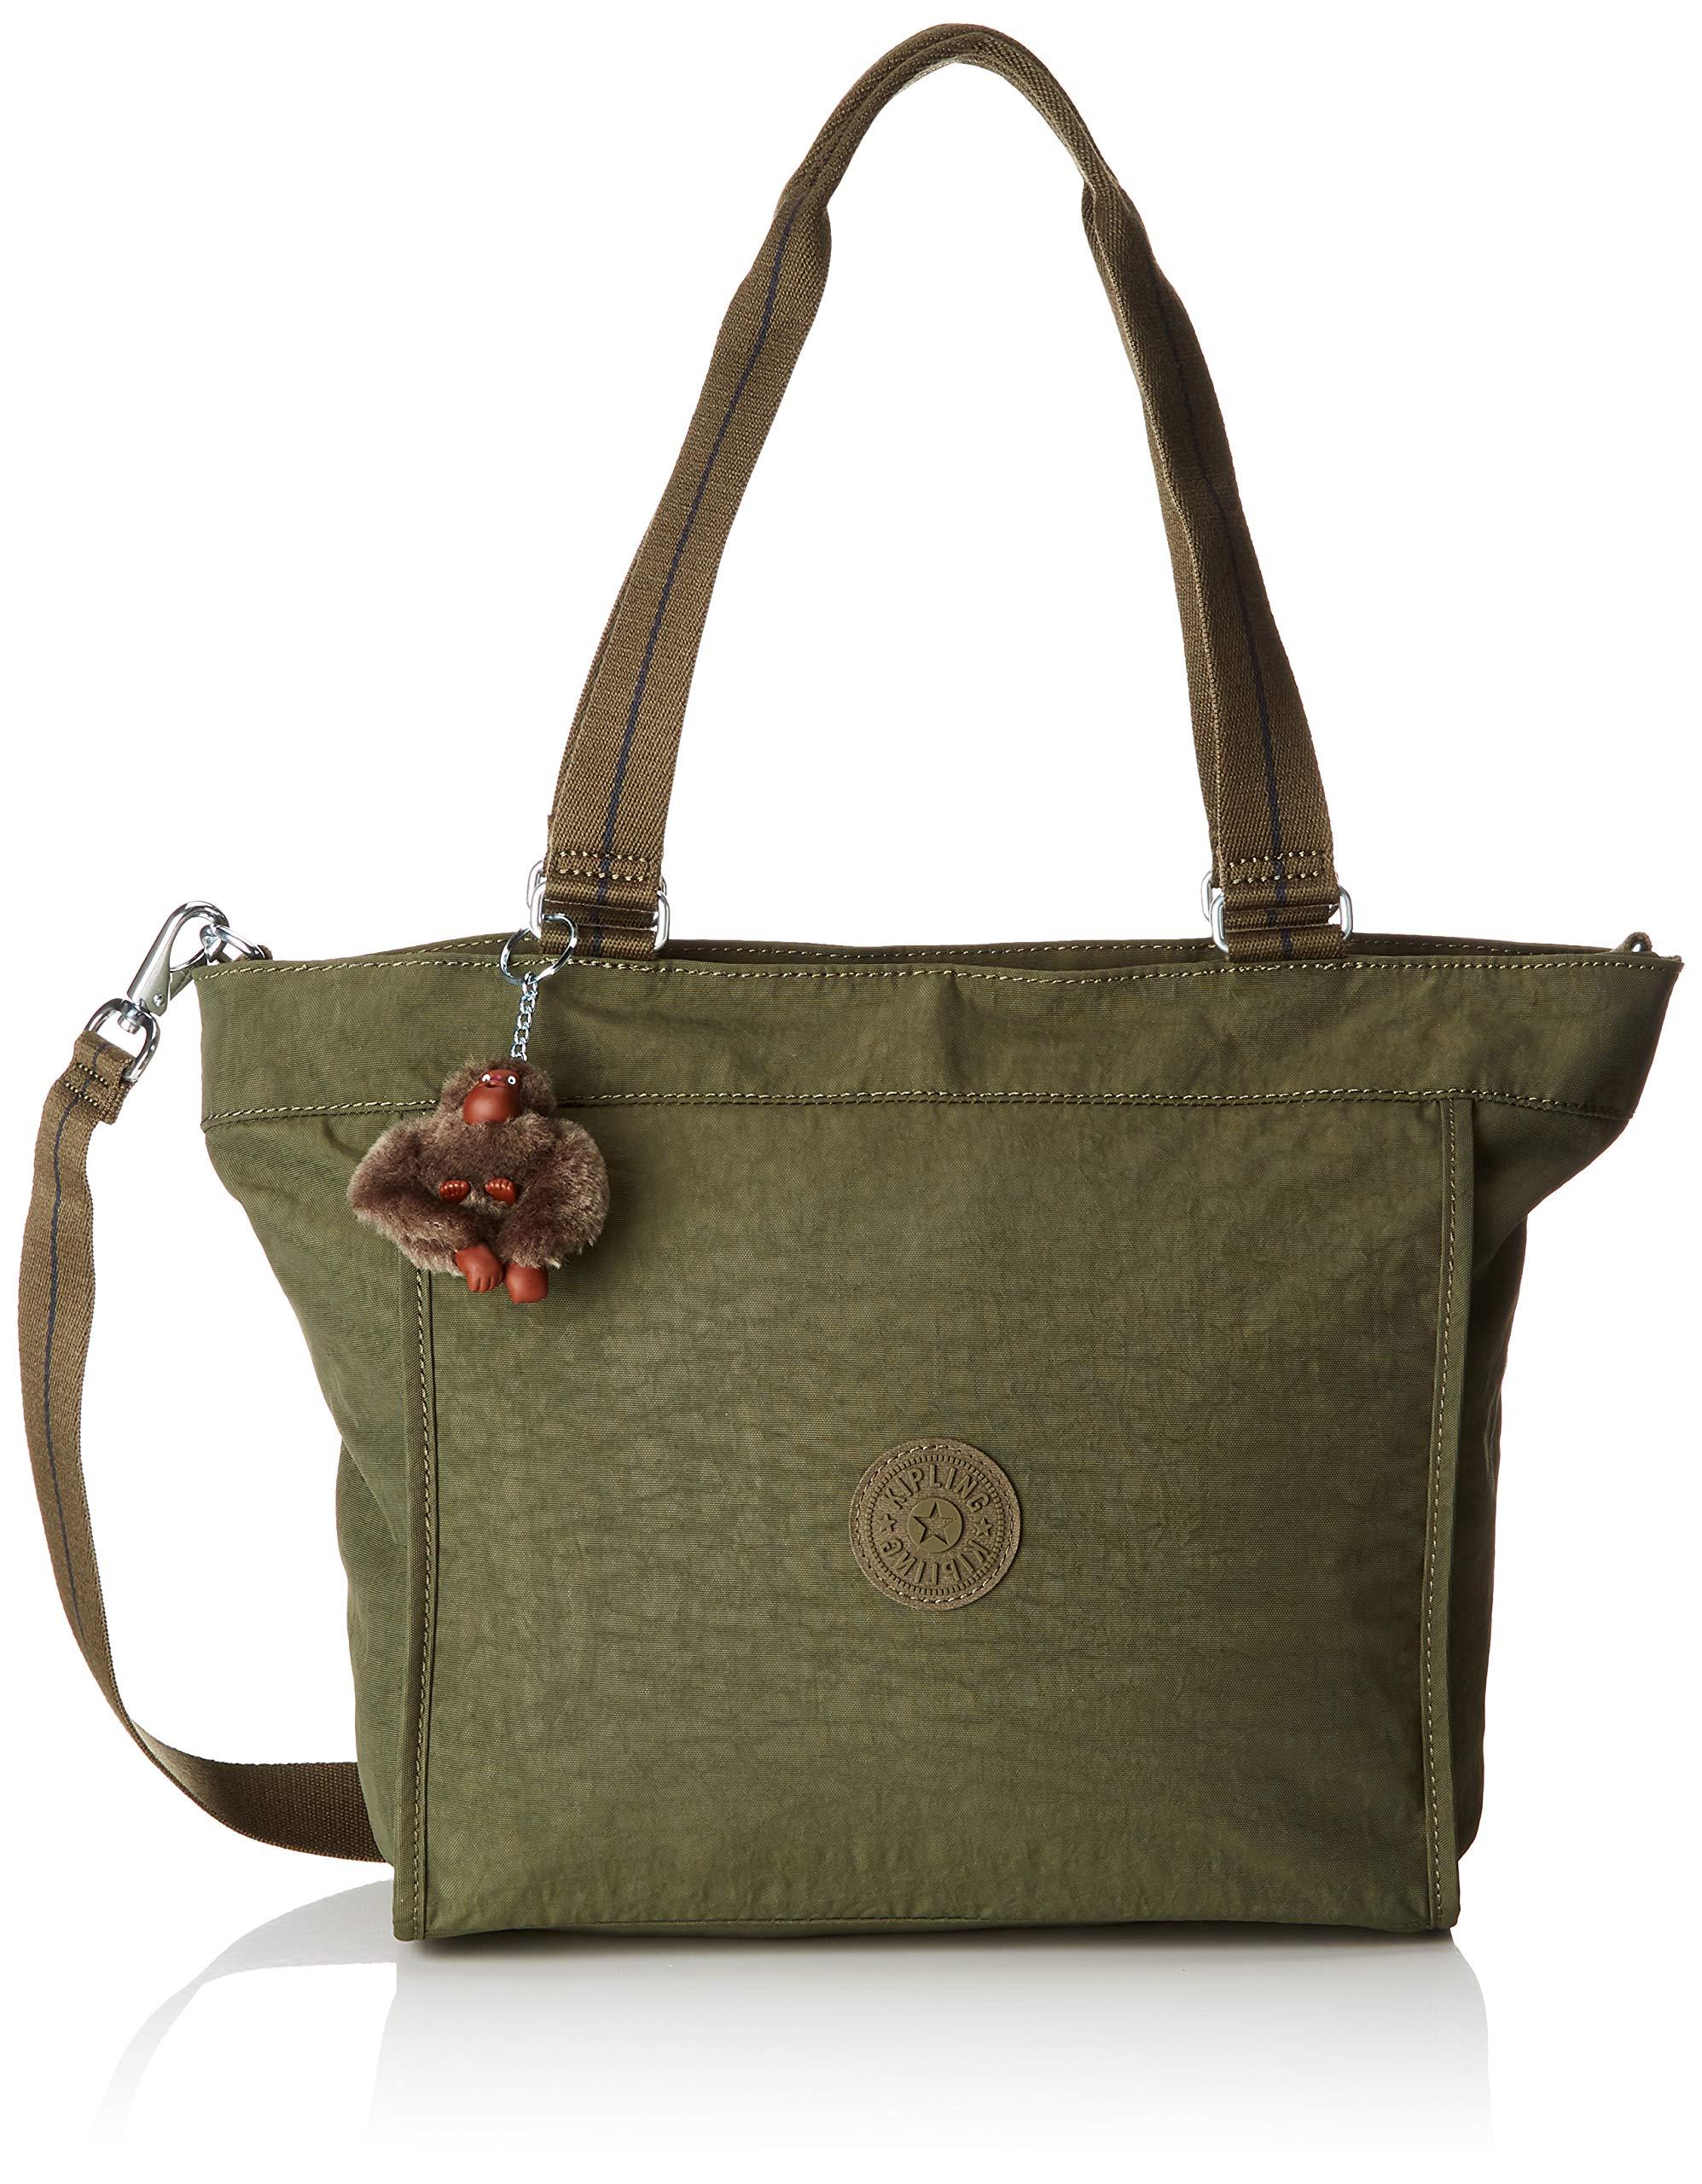 Kipling New Shopper S, Mujer, 42x27x13 cm product image